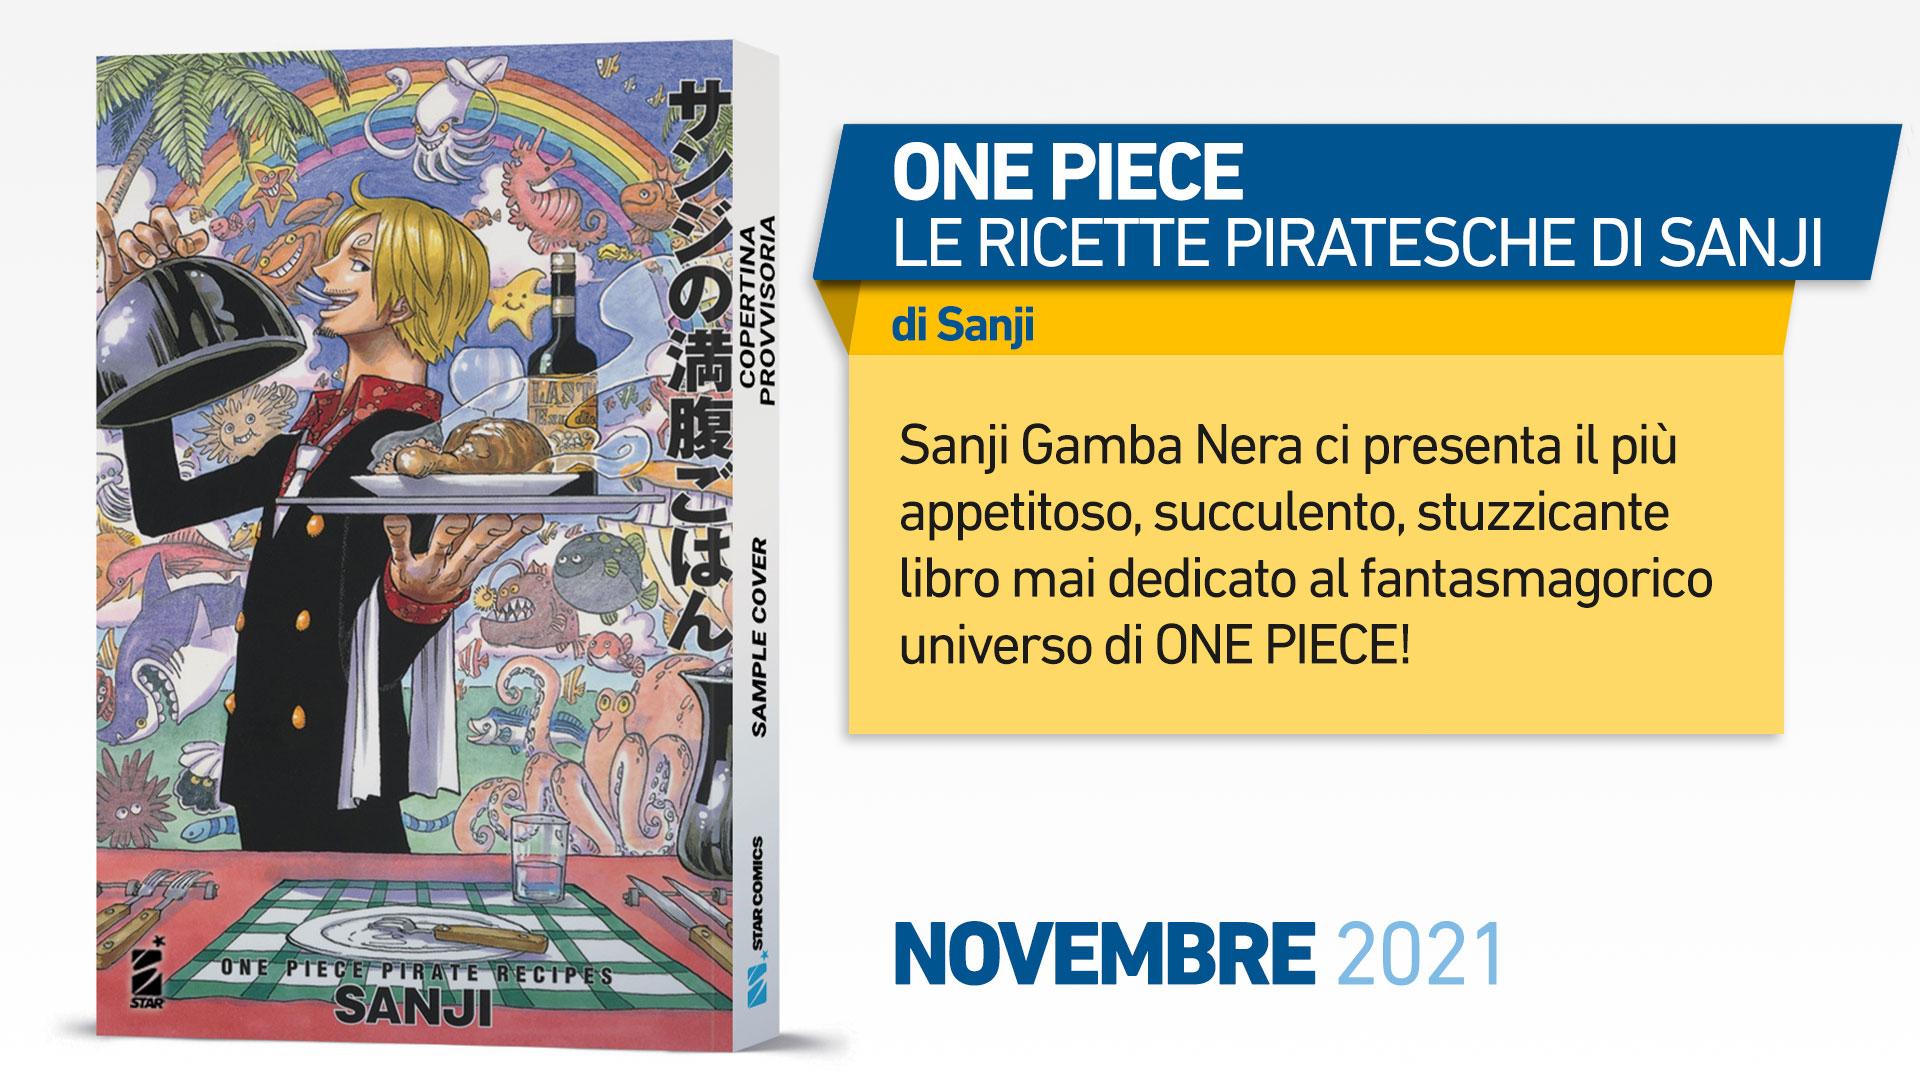 ONE PIECE – LE RICETTE PIRATESCHE DI SANJI